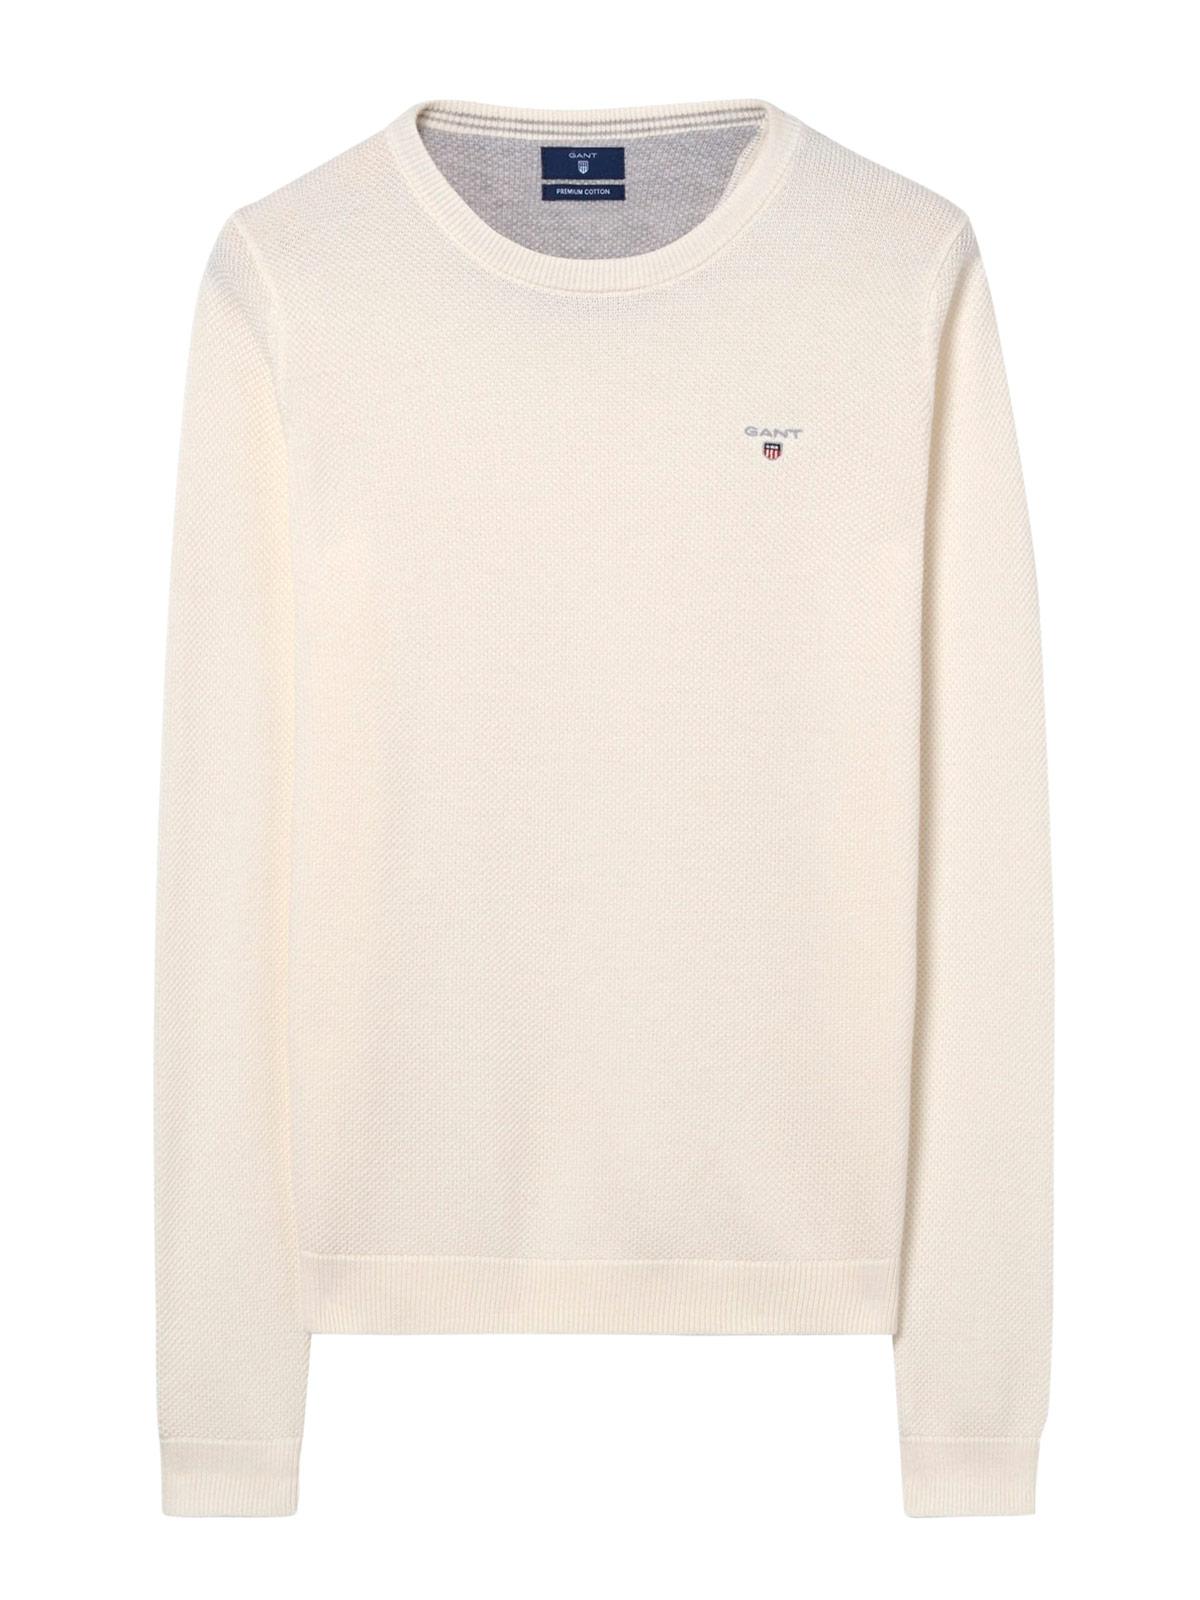 Picture of GANT | Women's Crewneck Sweater